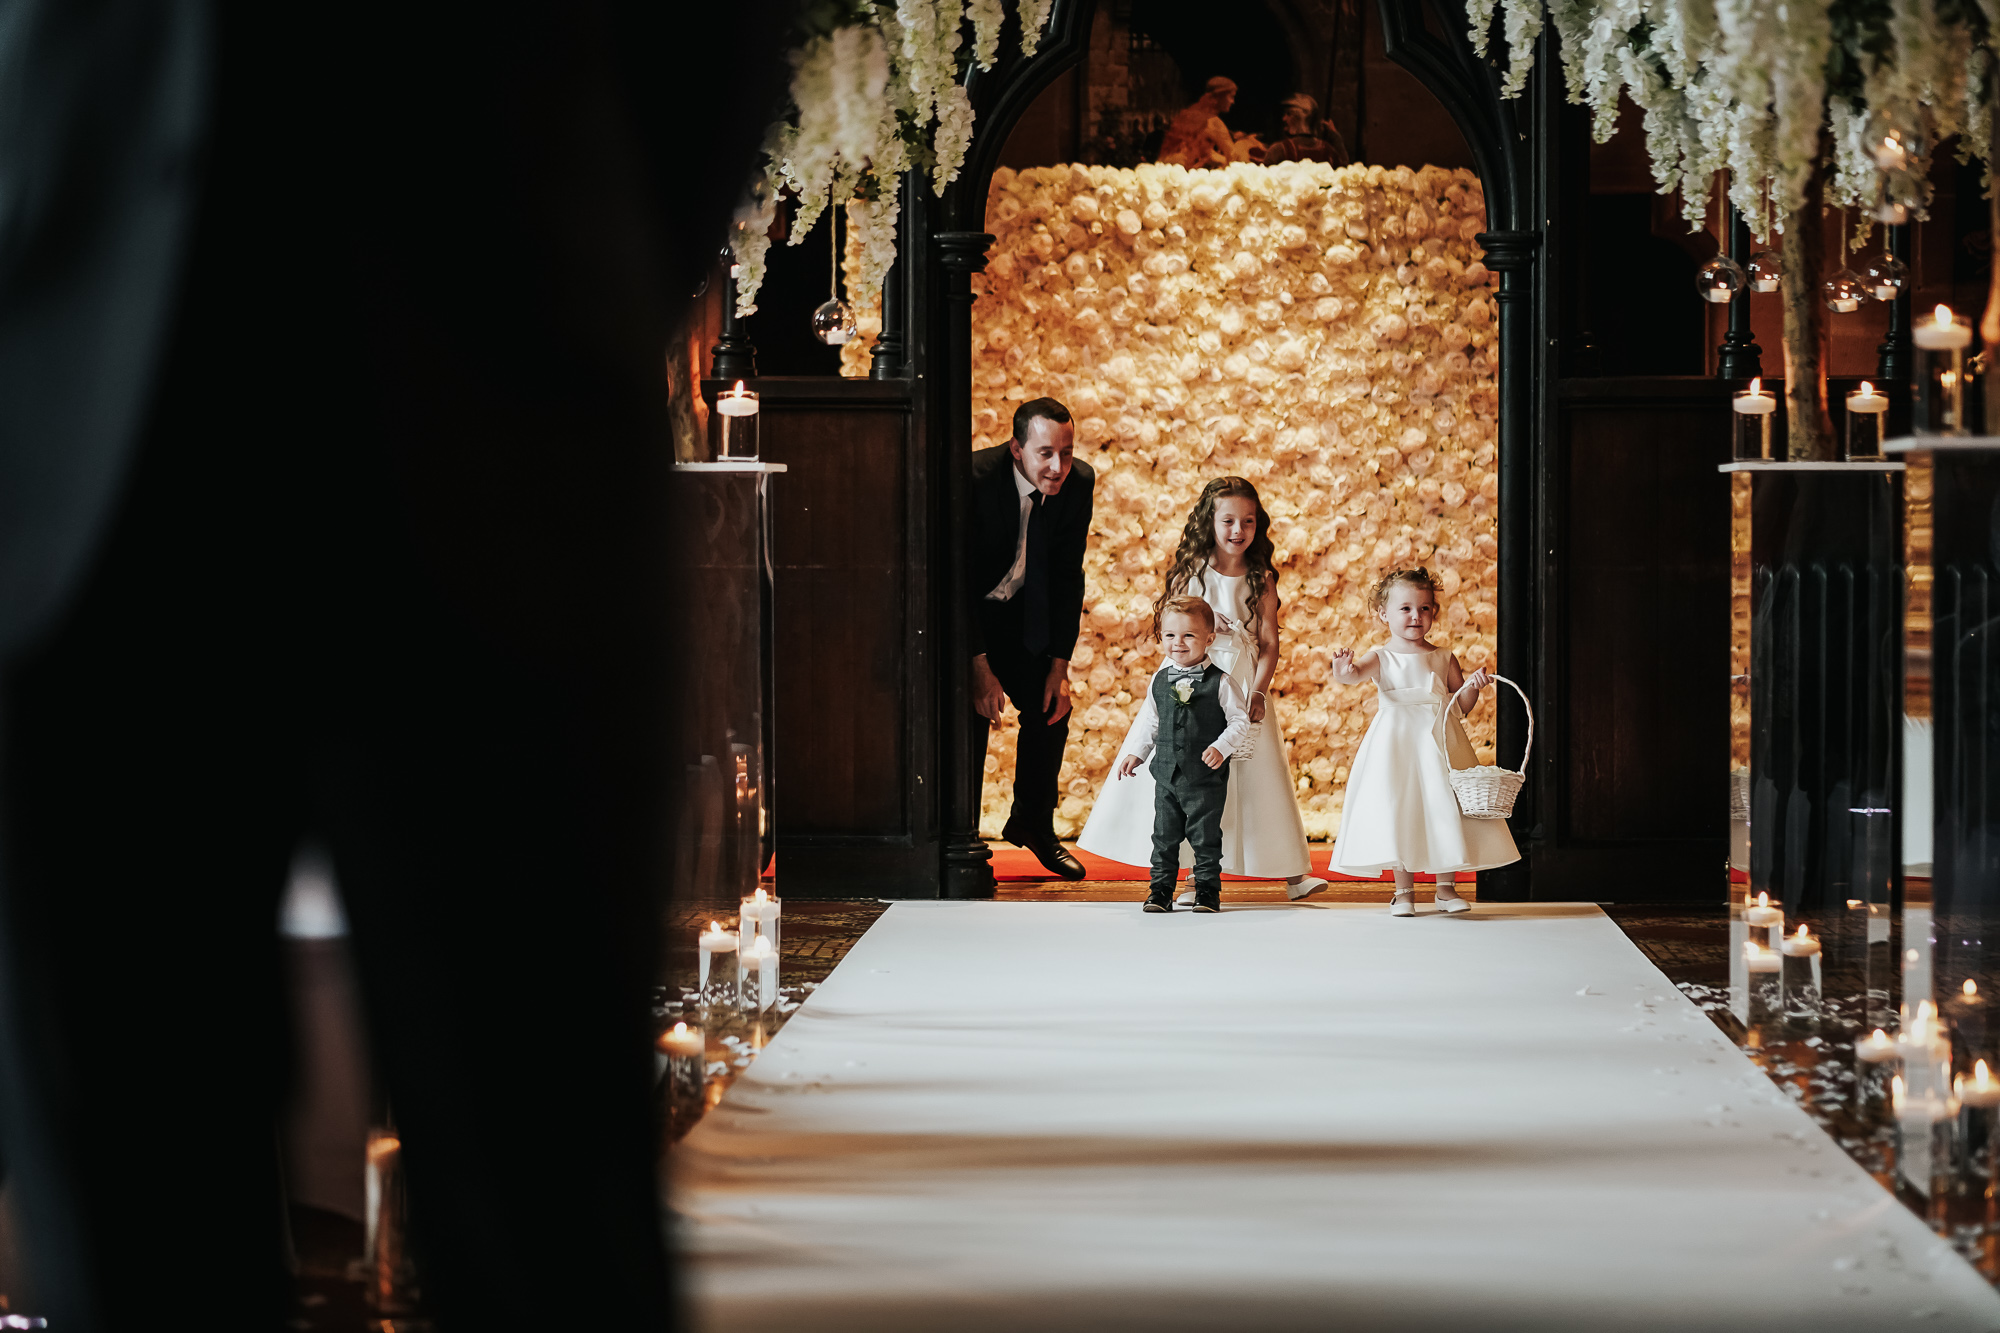 Peckforton Castle wedding photography cheshire wedding photographer (19 of 57).jpg